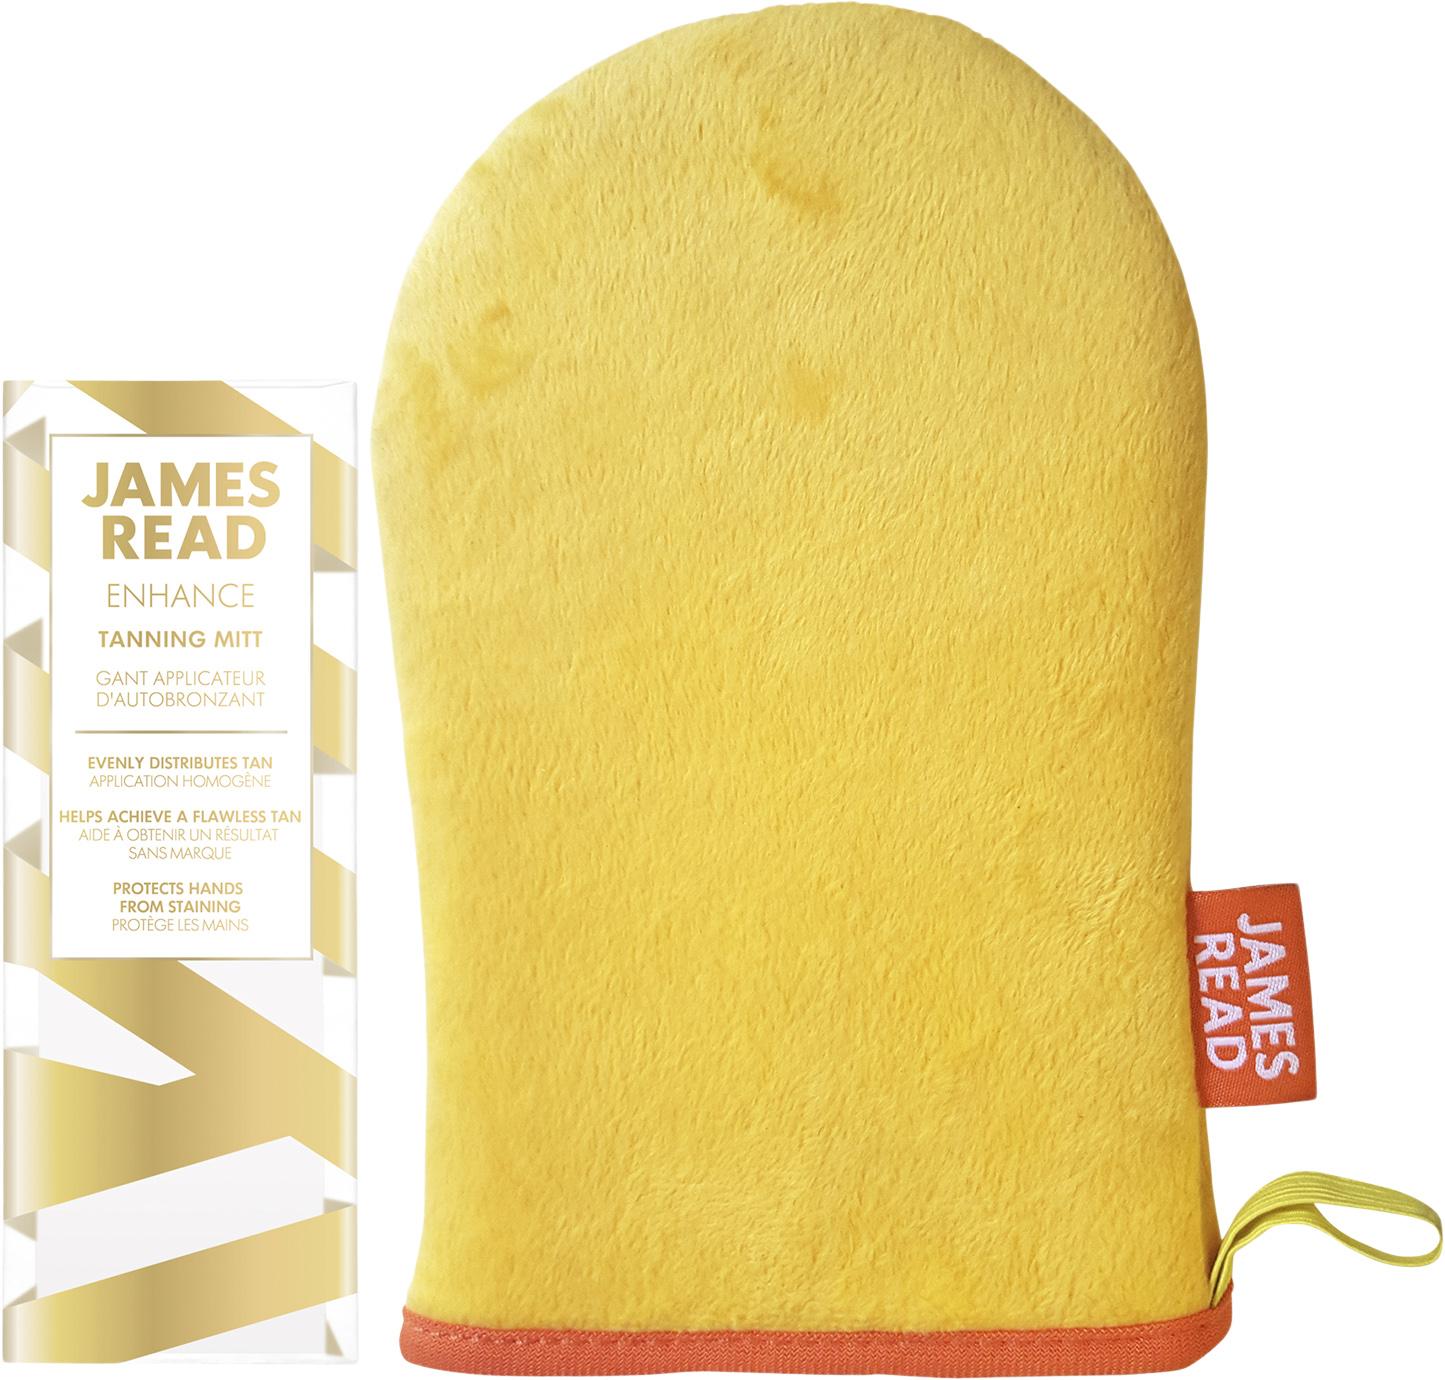 James Read - New Tanning Mitt